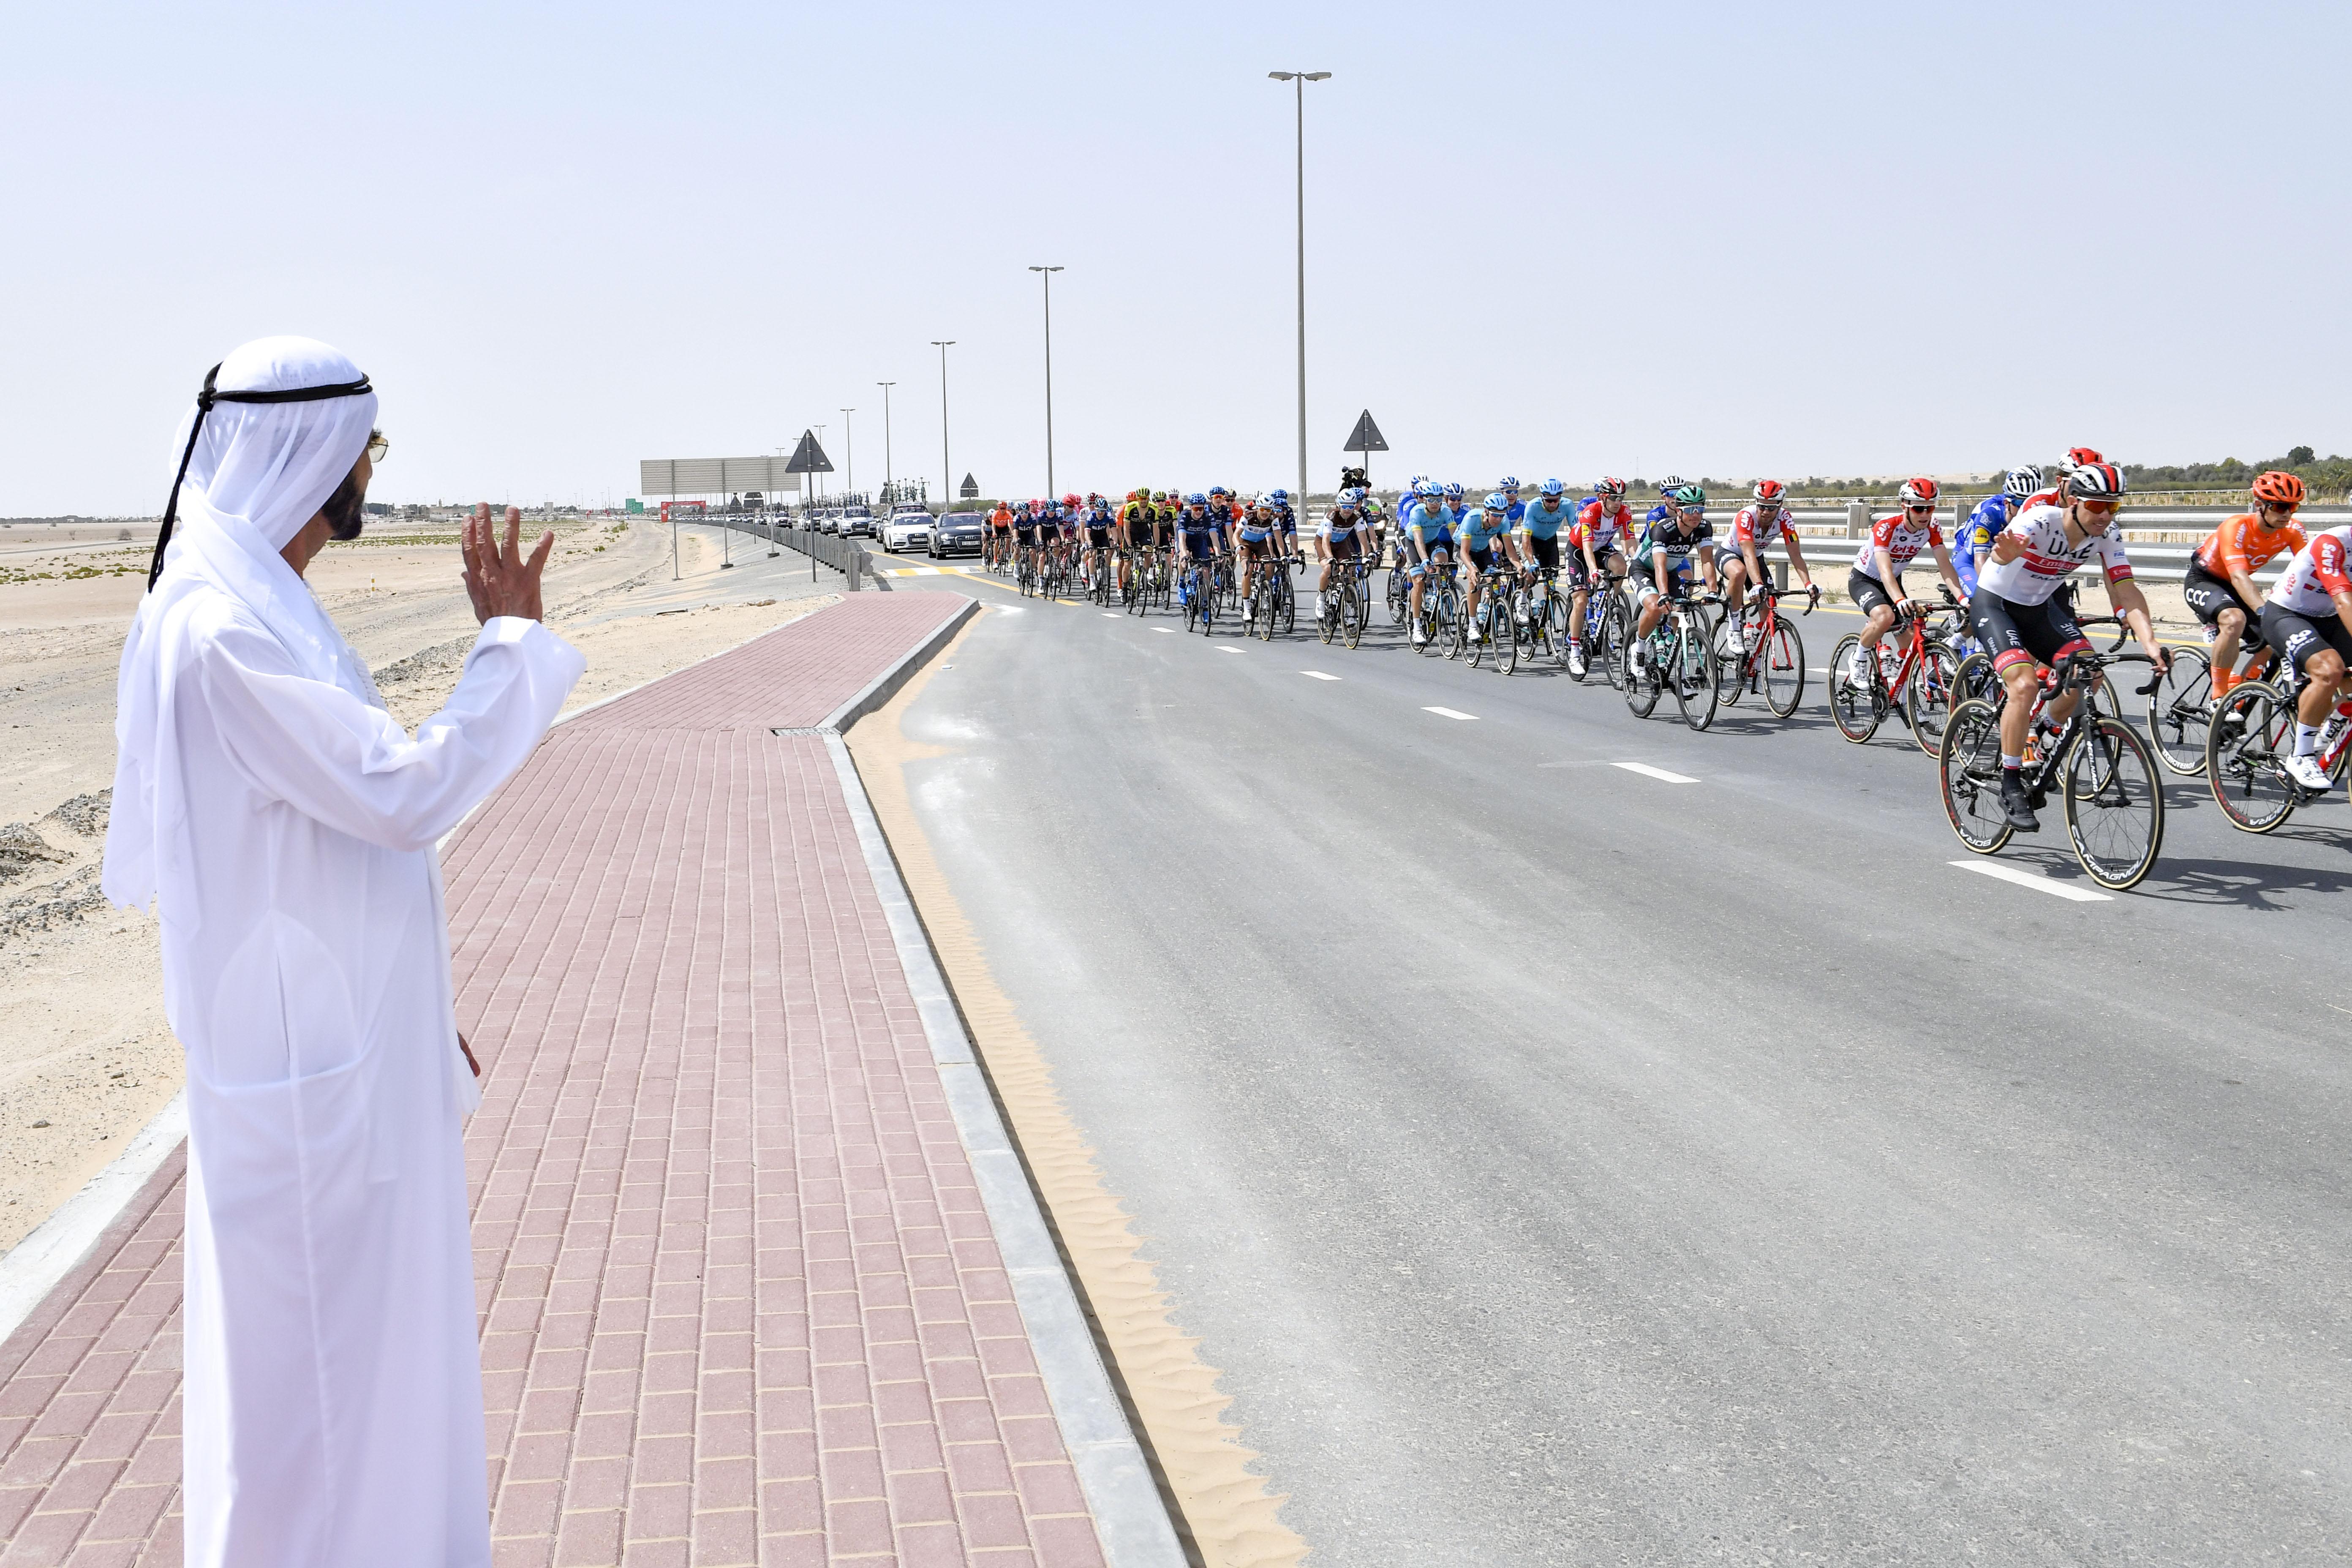 His Highness Sheikh Mohammed bin Rashid Al Maktoum - Mohammed bin Rashid attends The UAE Tour